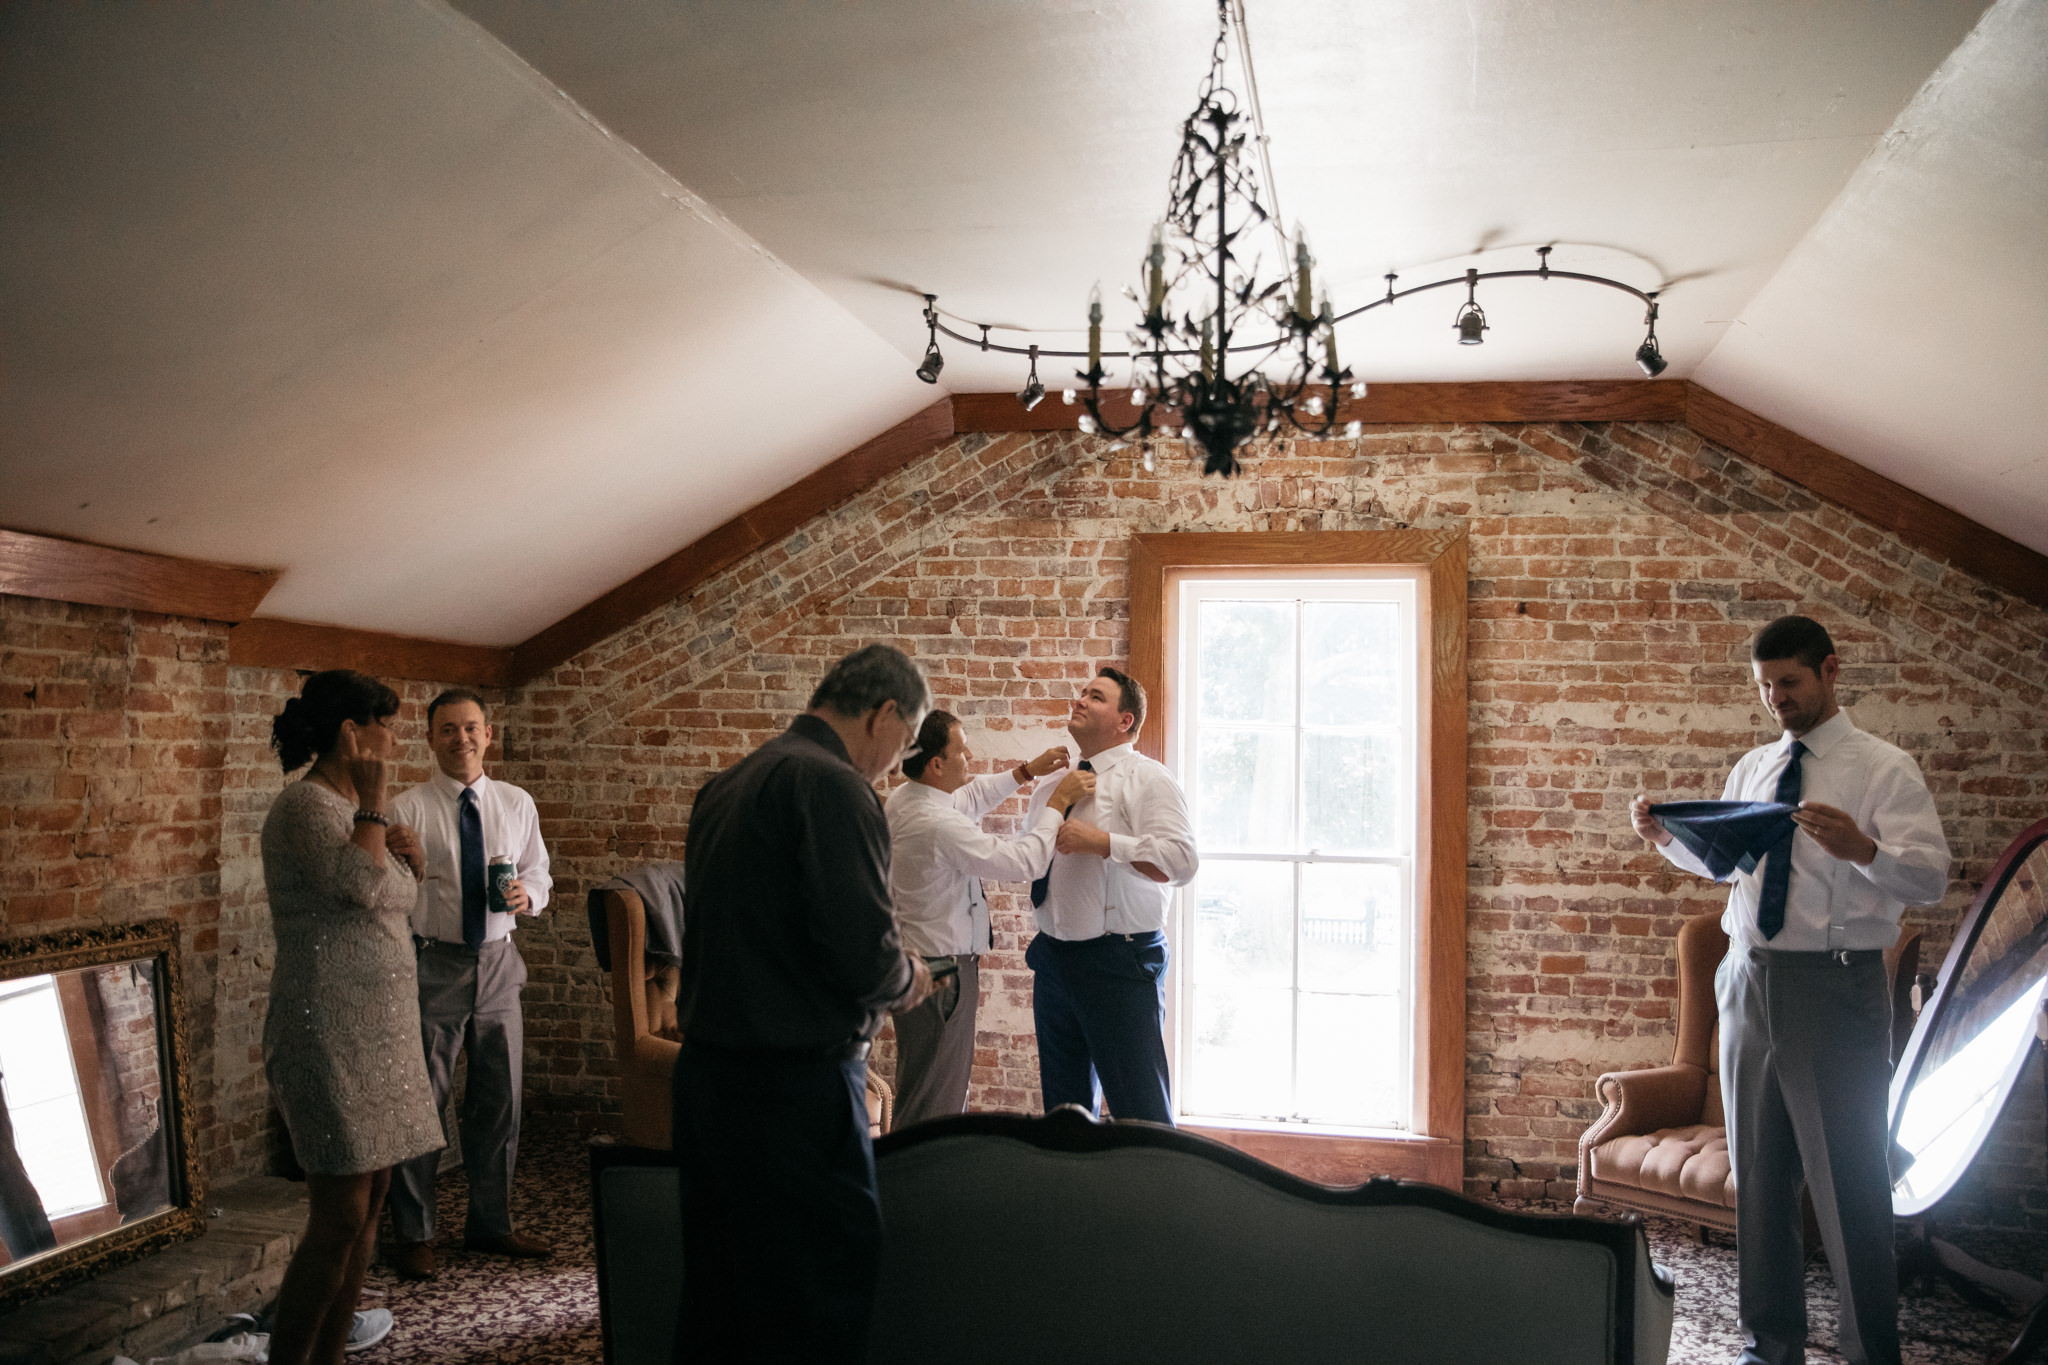 woodruff-fontaine-wedding-venue-memphis-thewarmtharoundyou-brenda-taylor-6.jpg